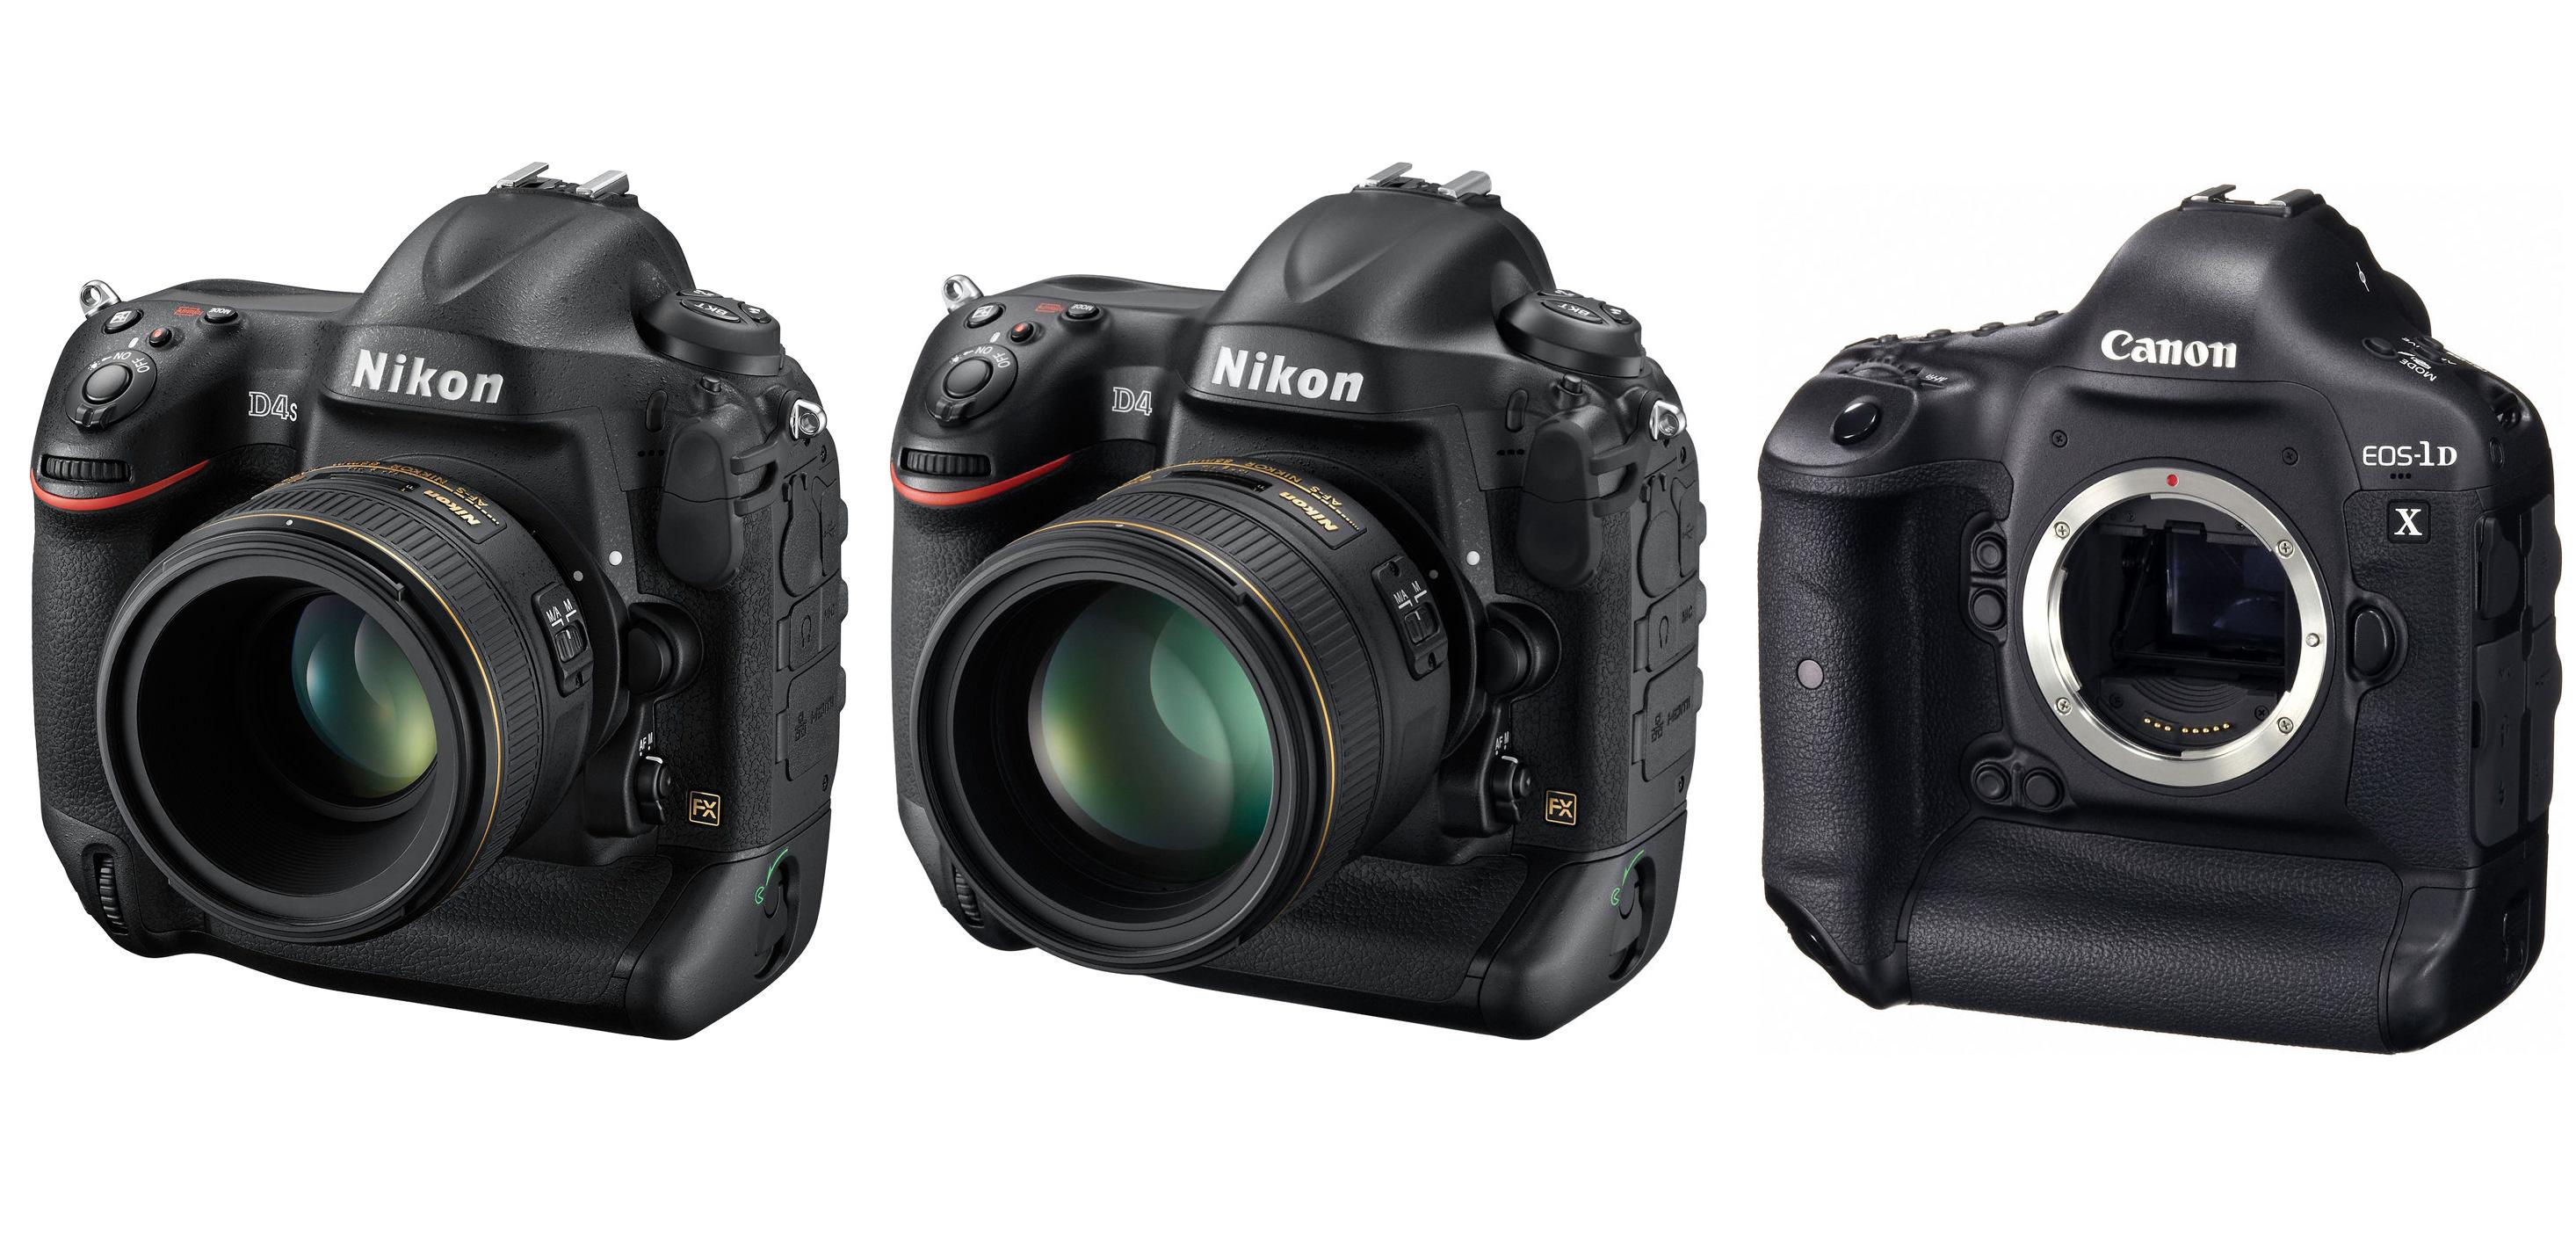 尼康d4s和佳能1dx_Nikon D4S Vs. Nikon D4 Vs. Canon EOS-1D X Specs Comparison – Camera News at Cameraegg